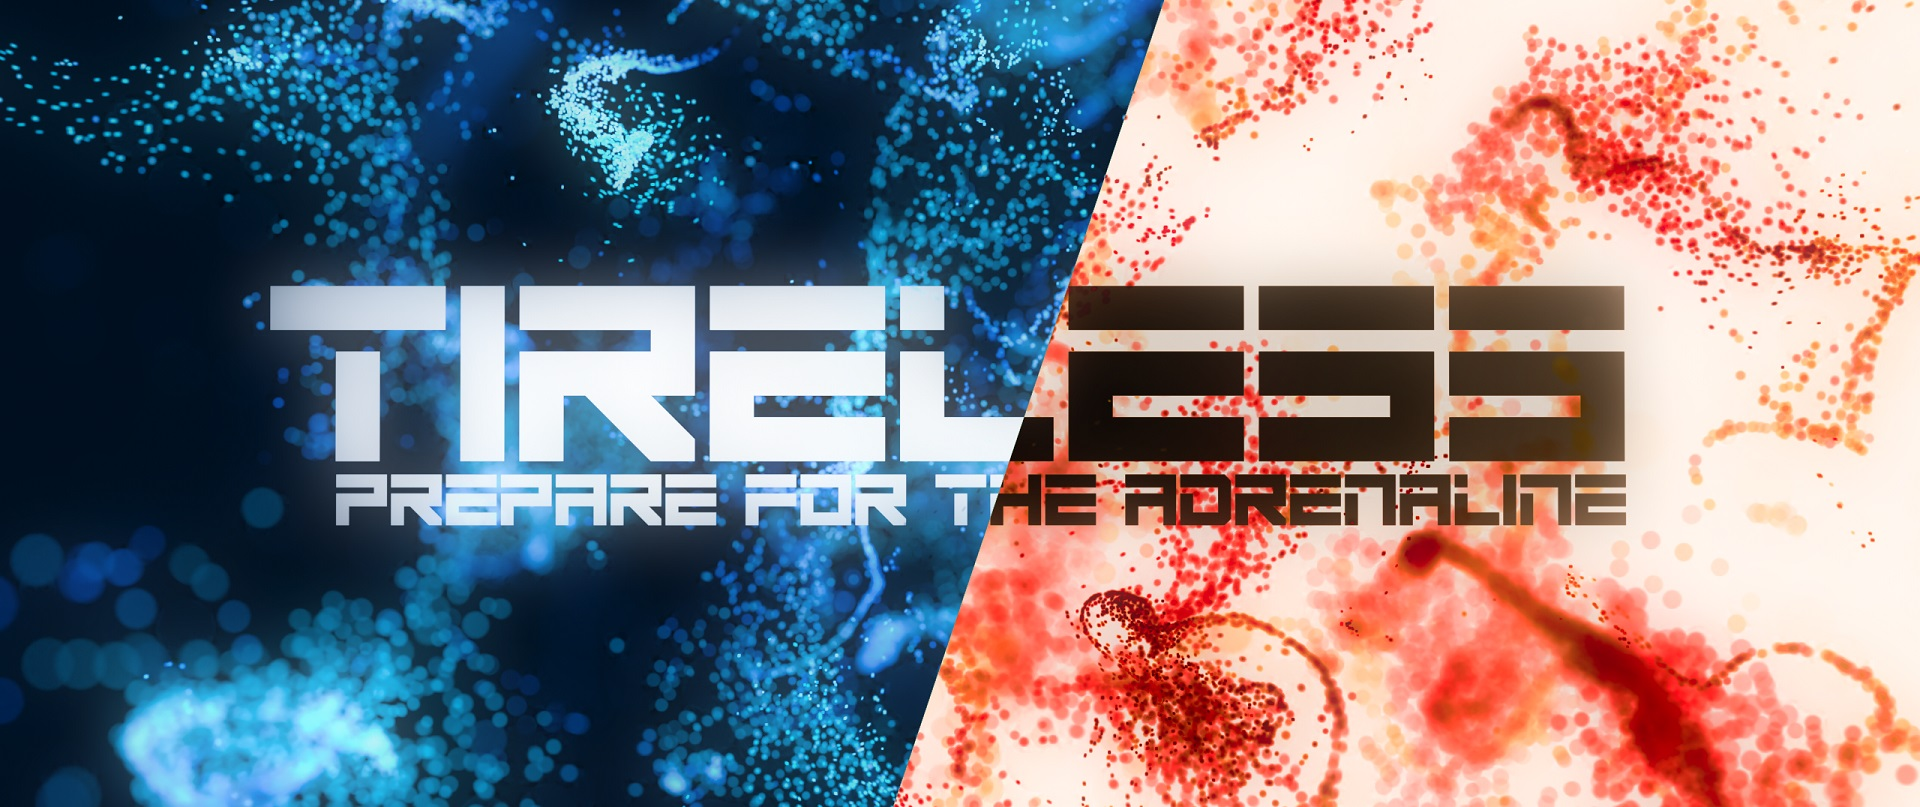 TIRELESS: Prepare For The Adrenaline [Challenging 3D Platformer]